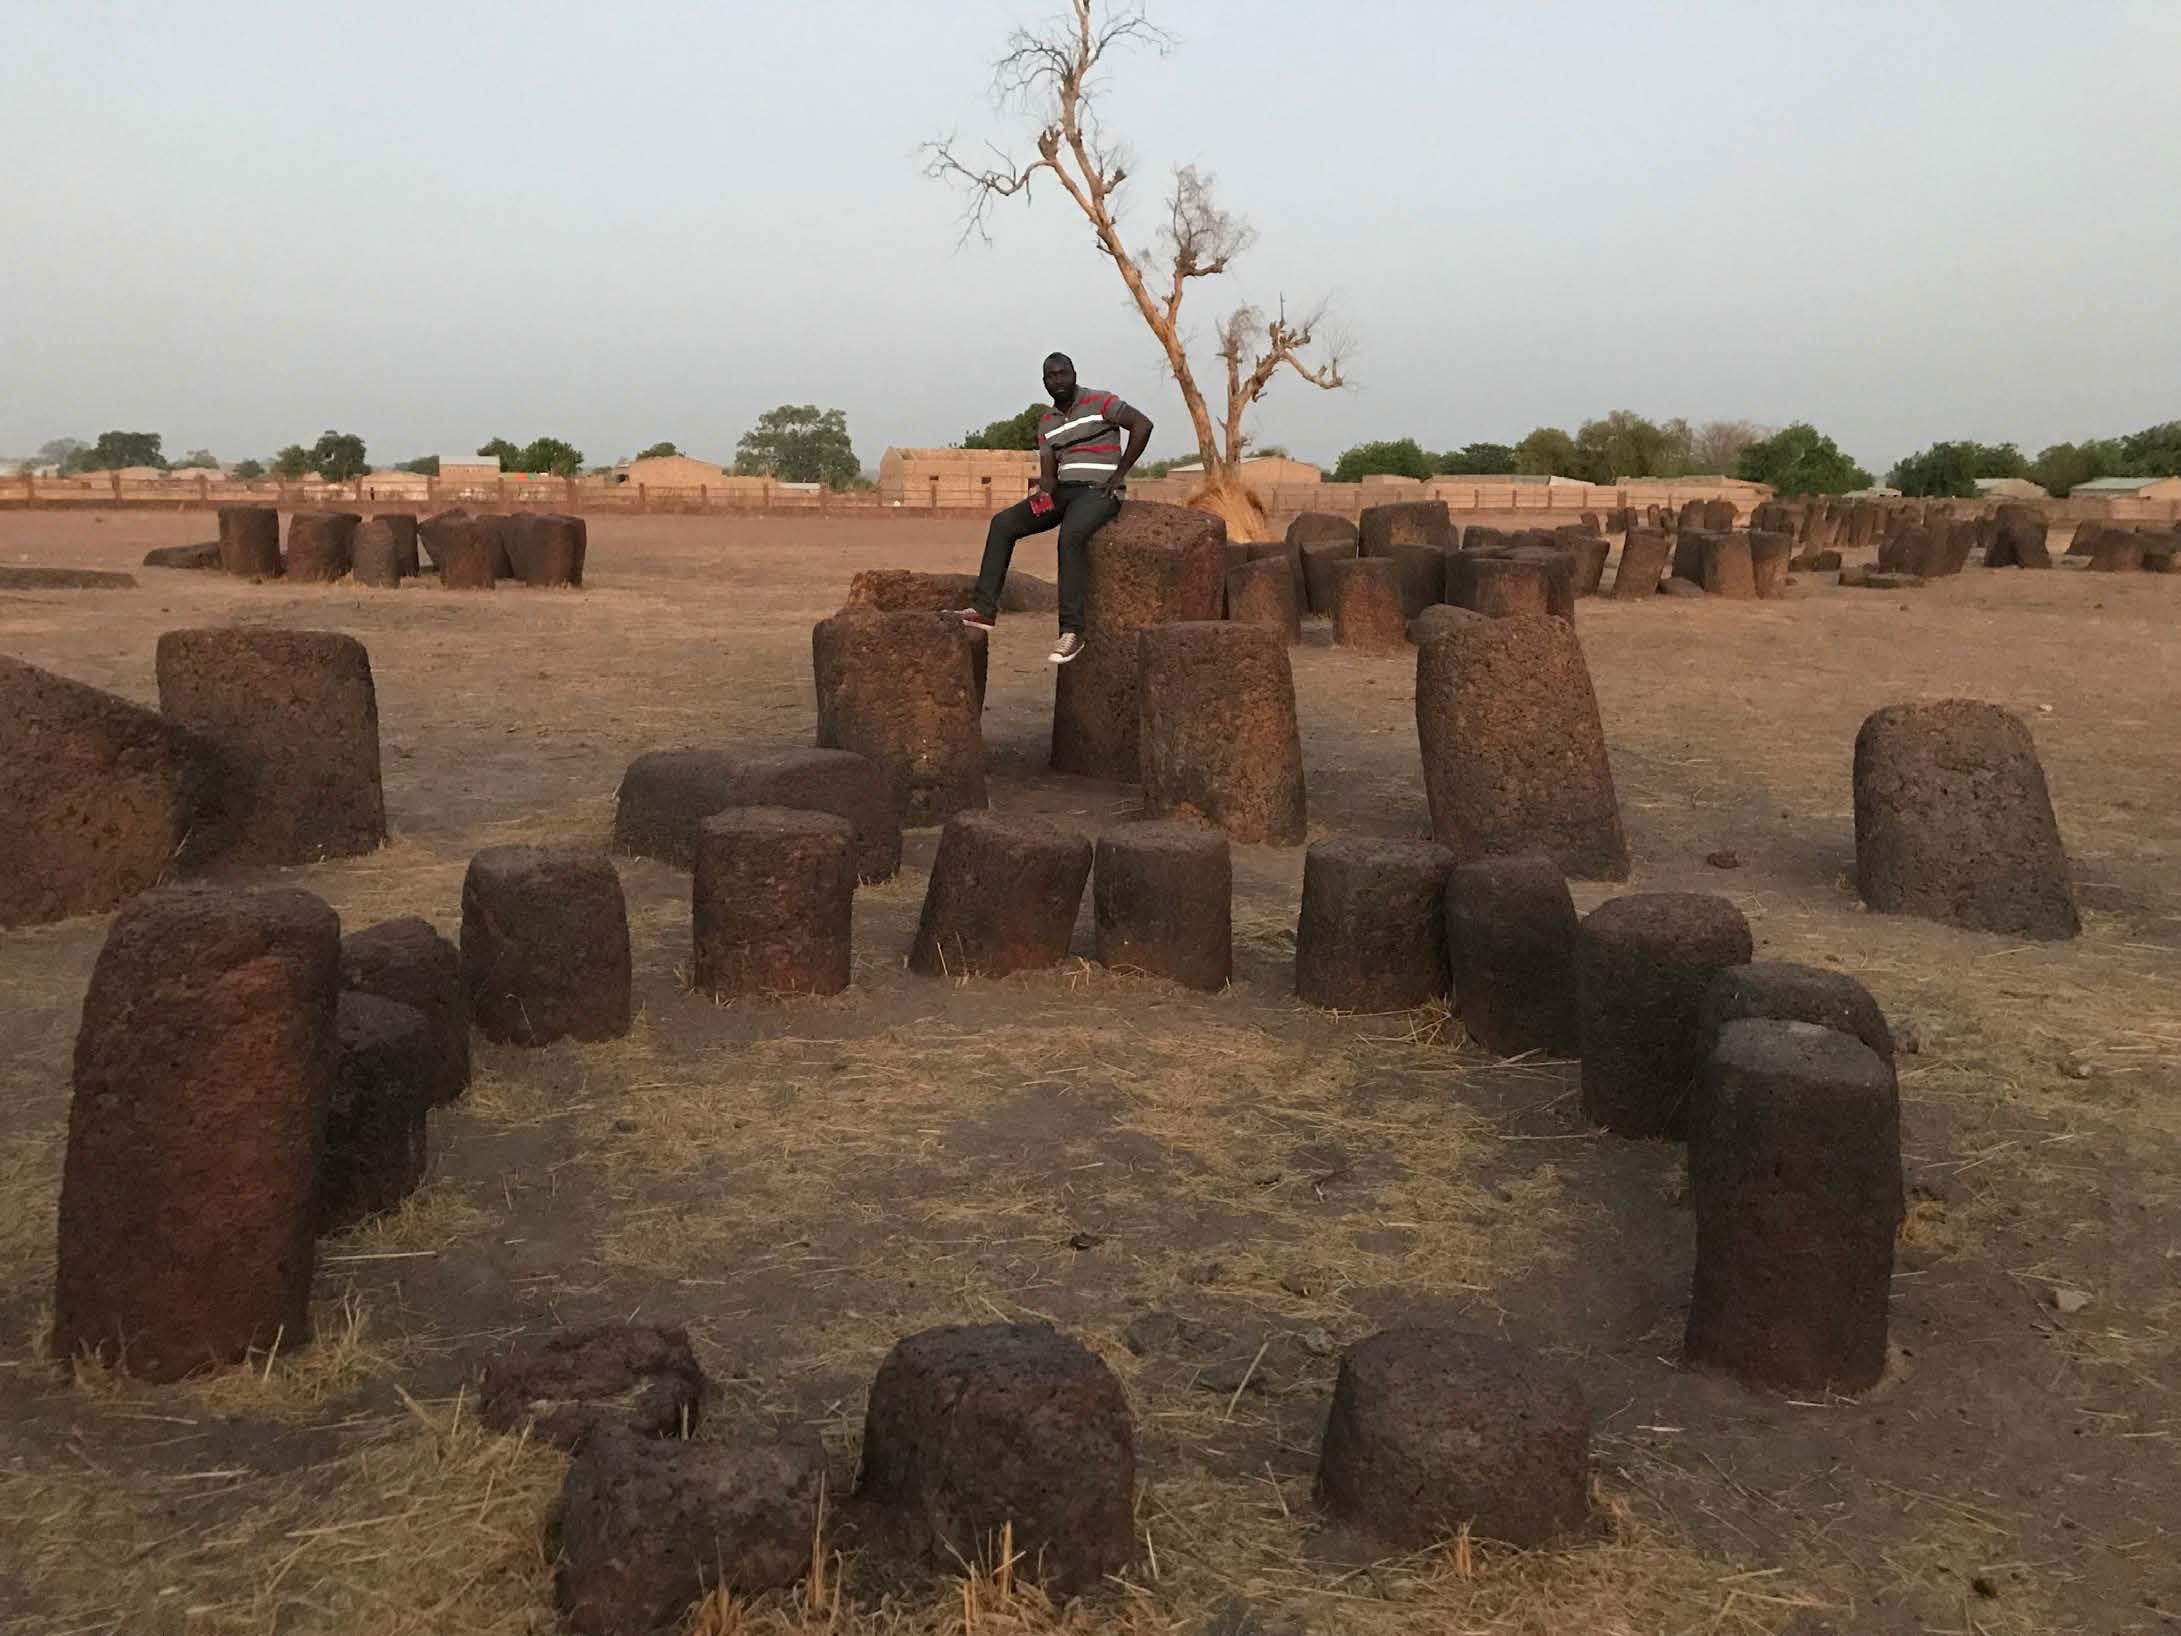 Stencirkler i Sine Ngayene, Senegal. Foto: Tabita Rezaire